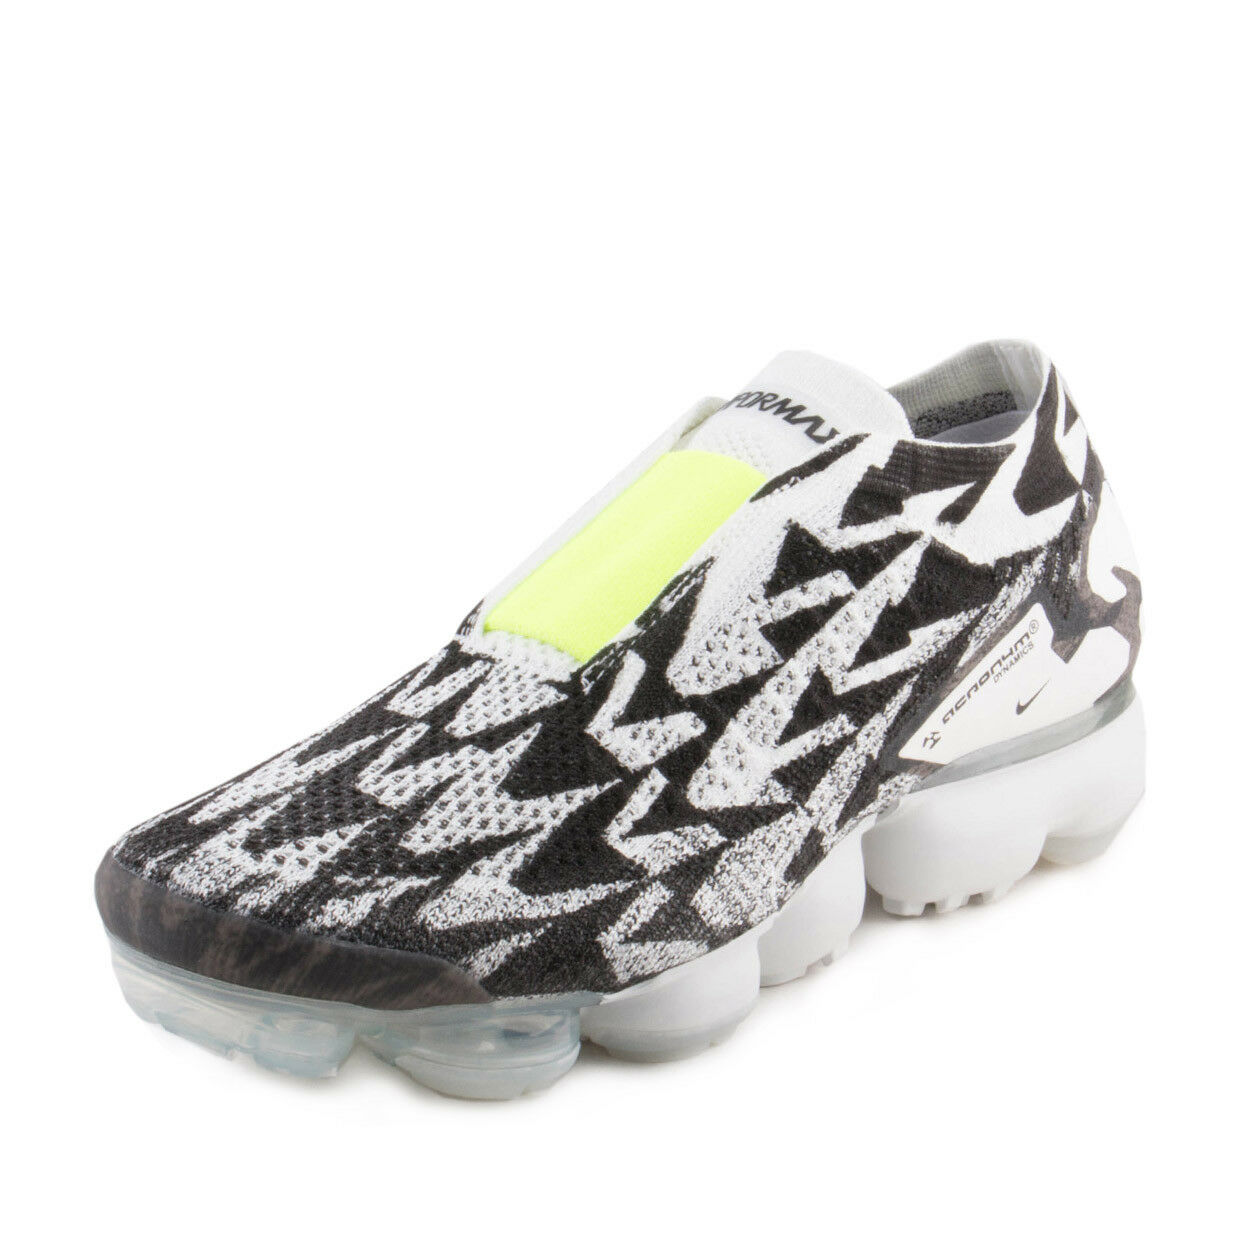 Nike Uomo aria vapormax fk moc 2 / acronimo luce ossa / volt-light osso aq0996-001